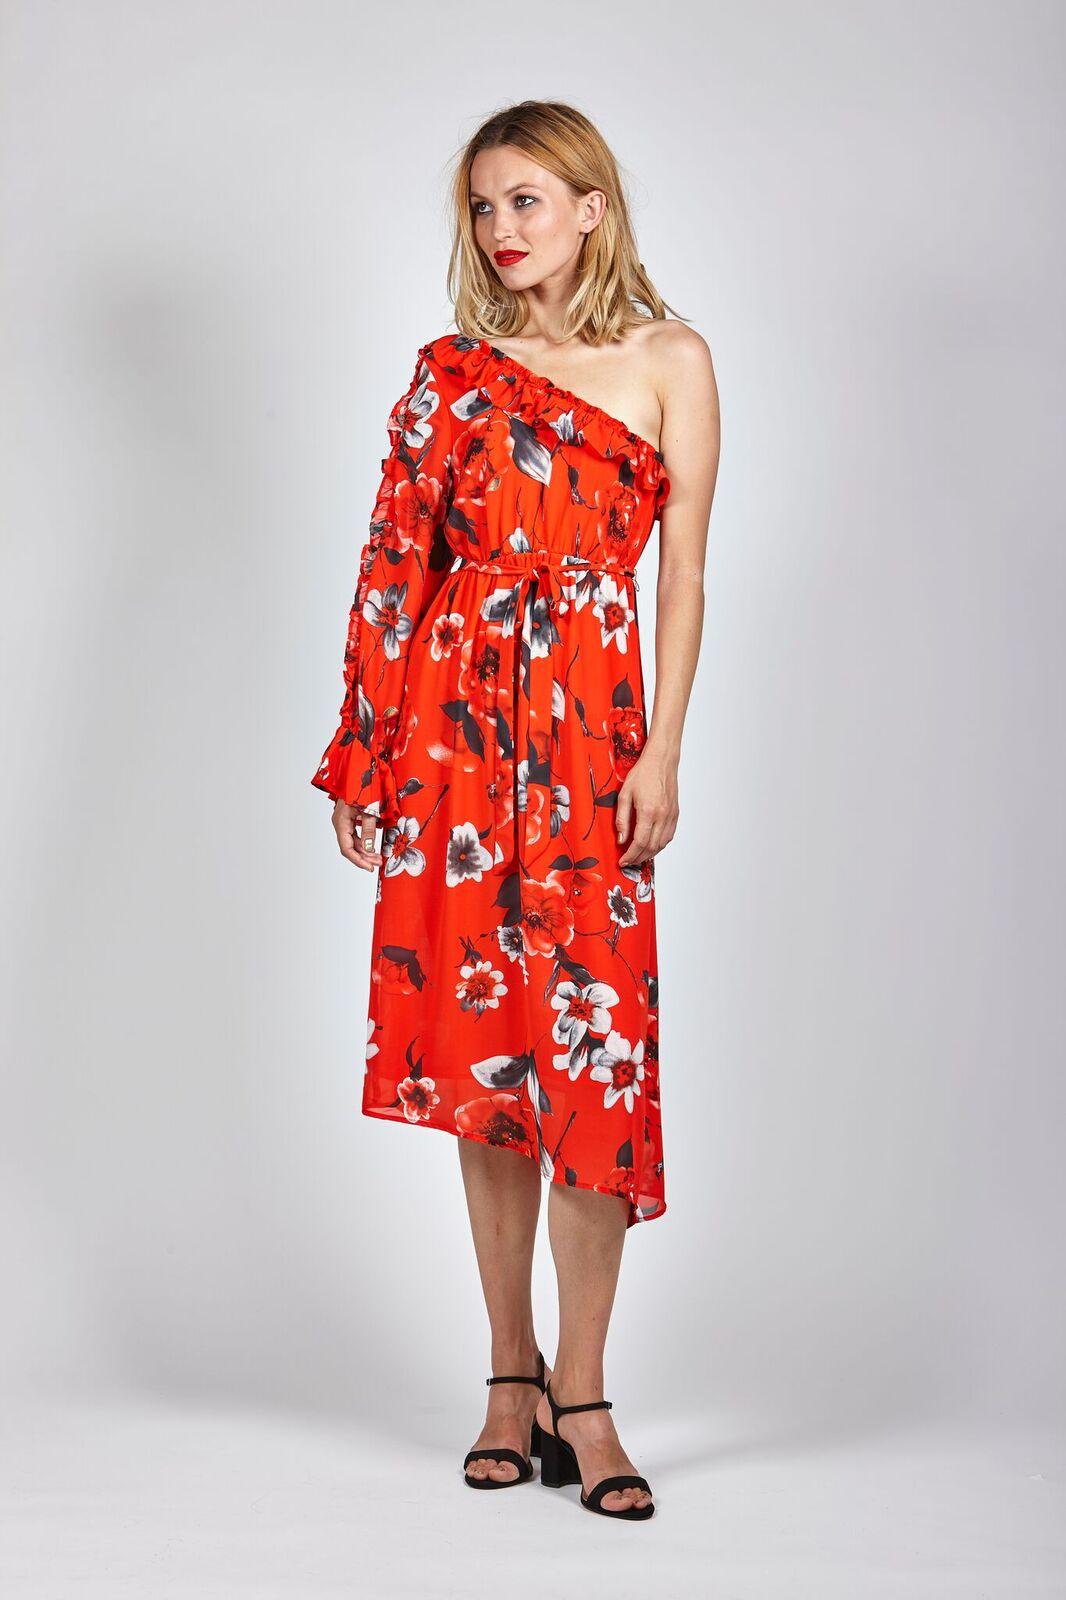 JDK914 Ketz-ke Heavenly Dress, RRP$198.00_preview